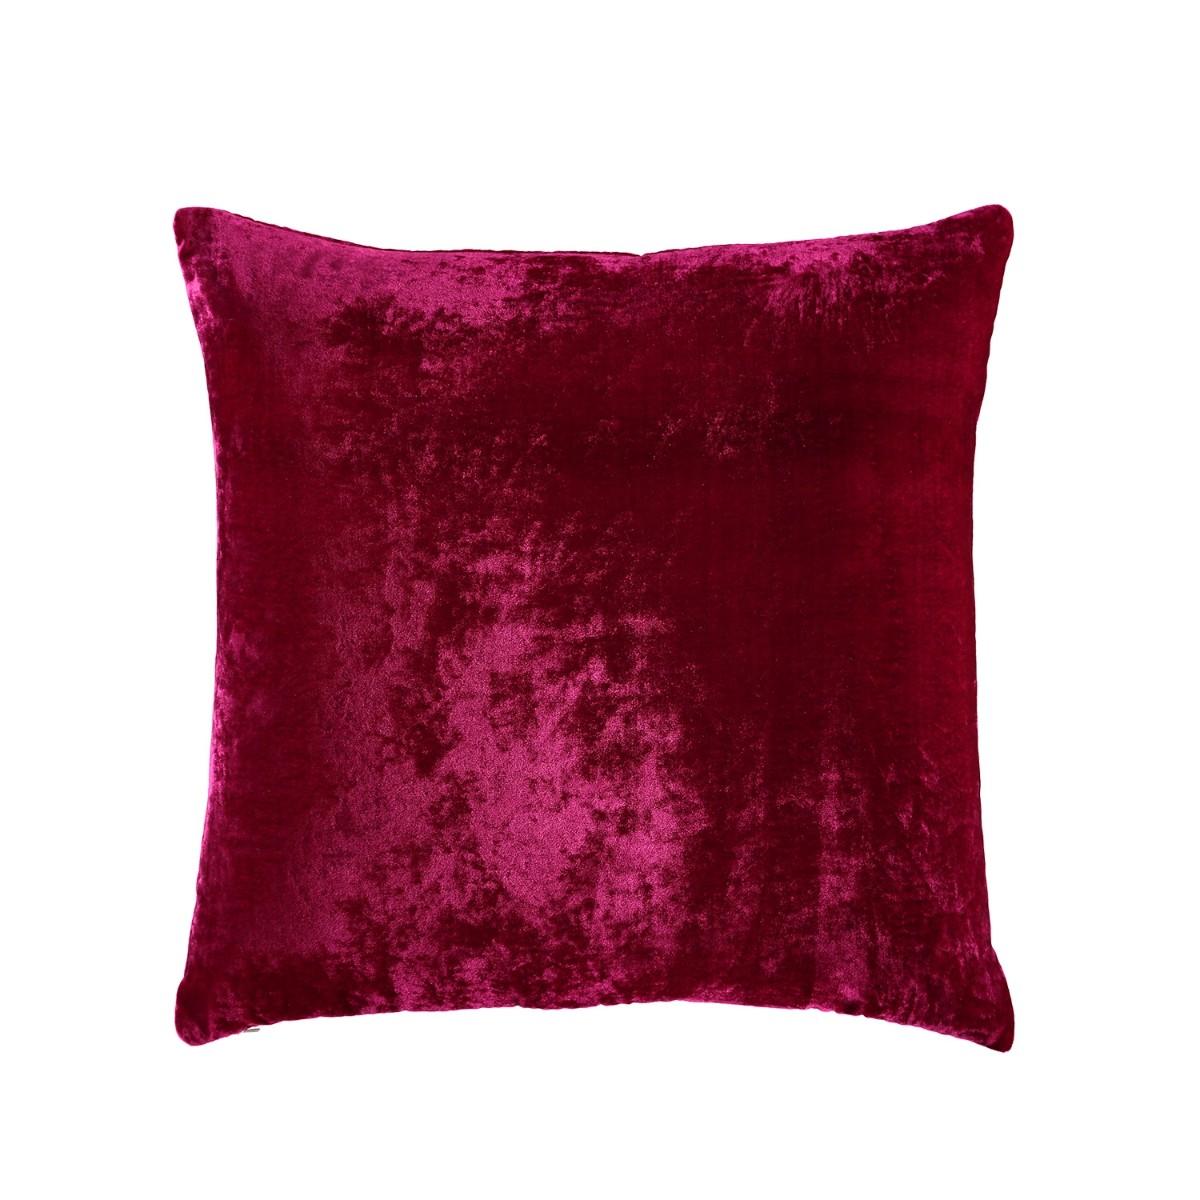 William Yeoward |Paddy Velvet Cushion Fuchsia